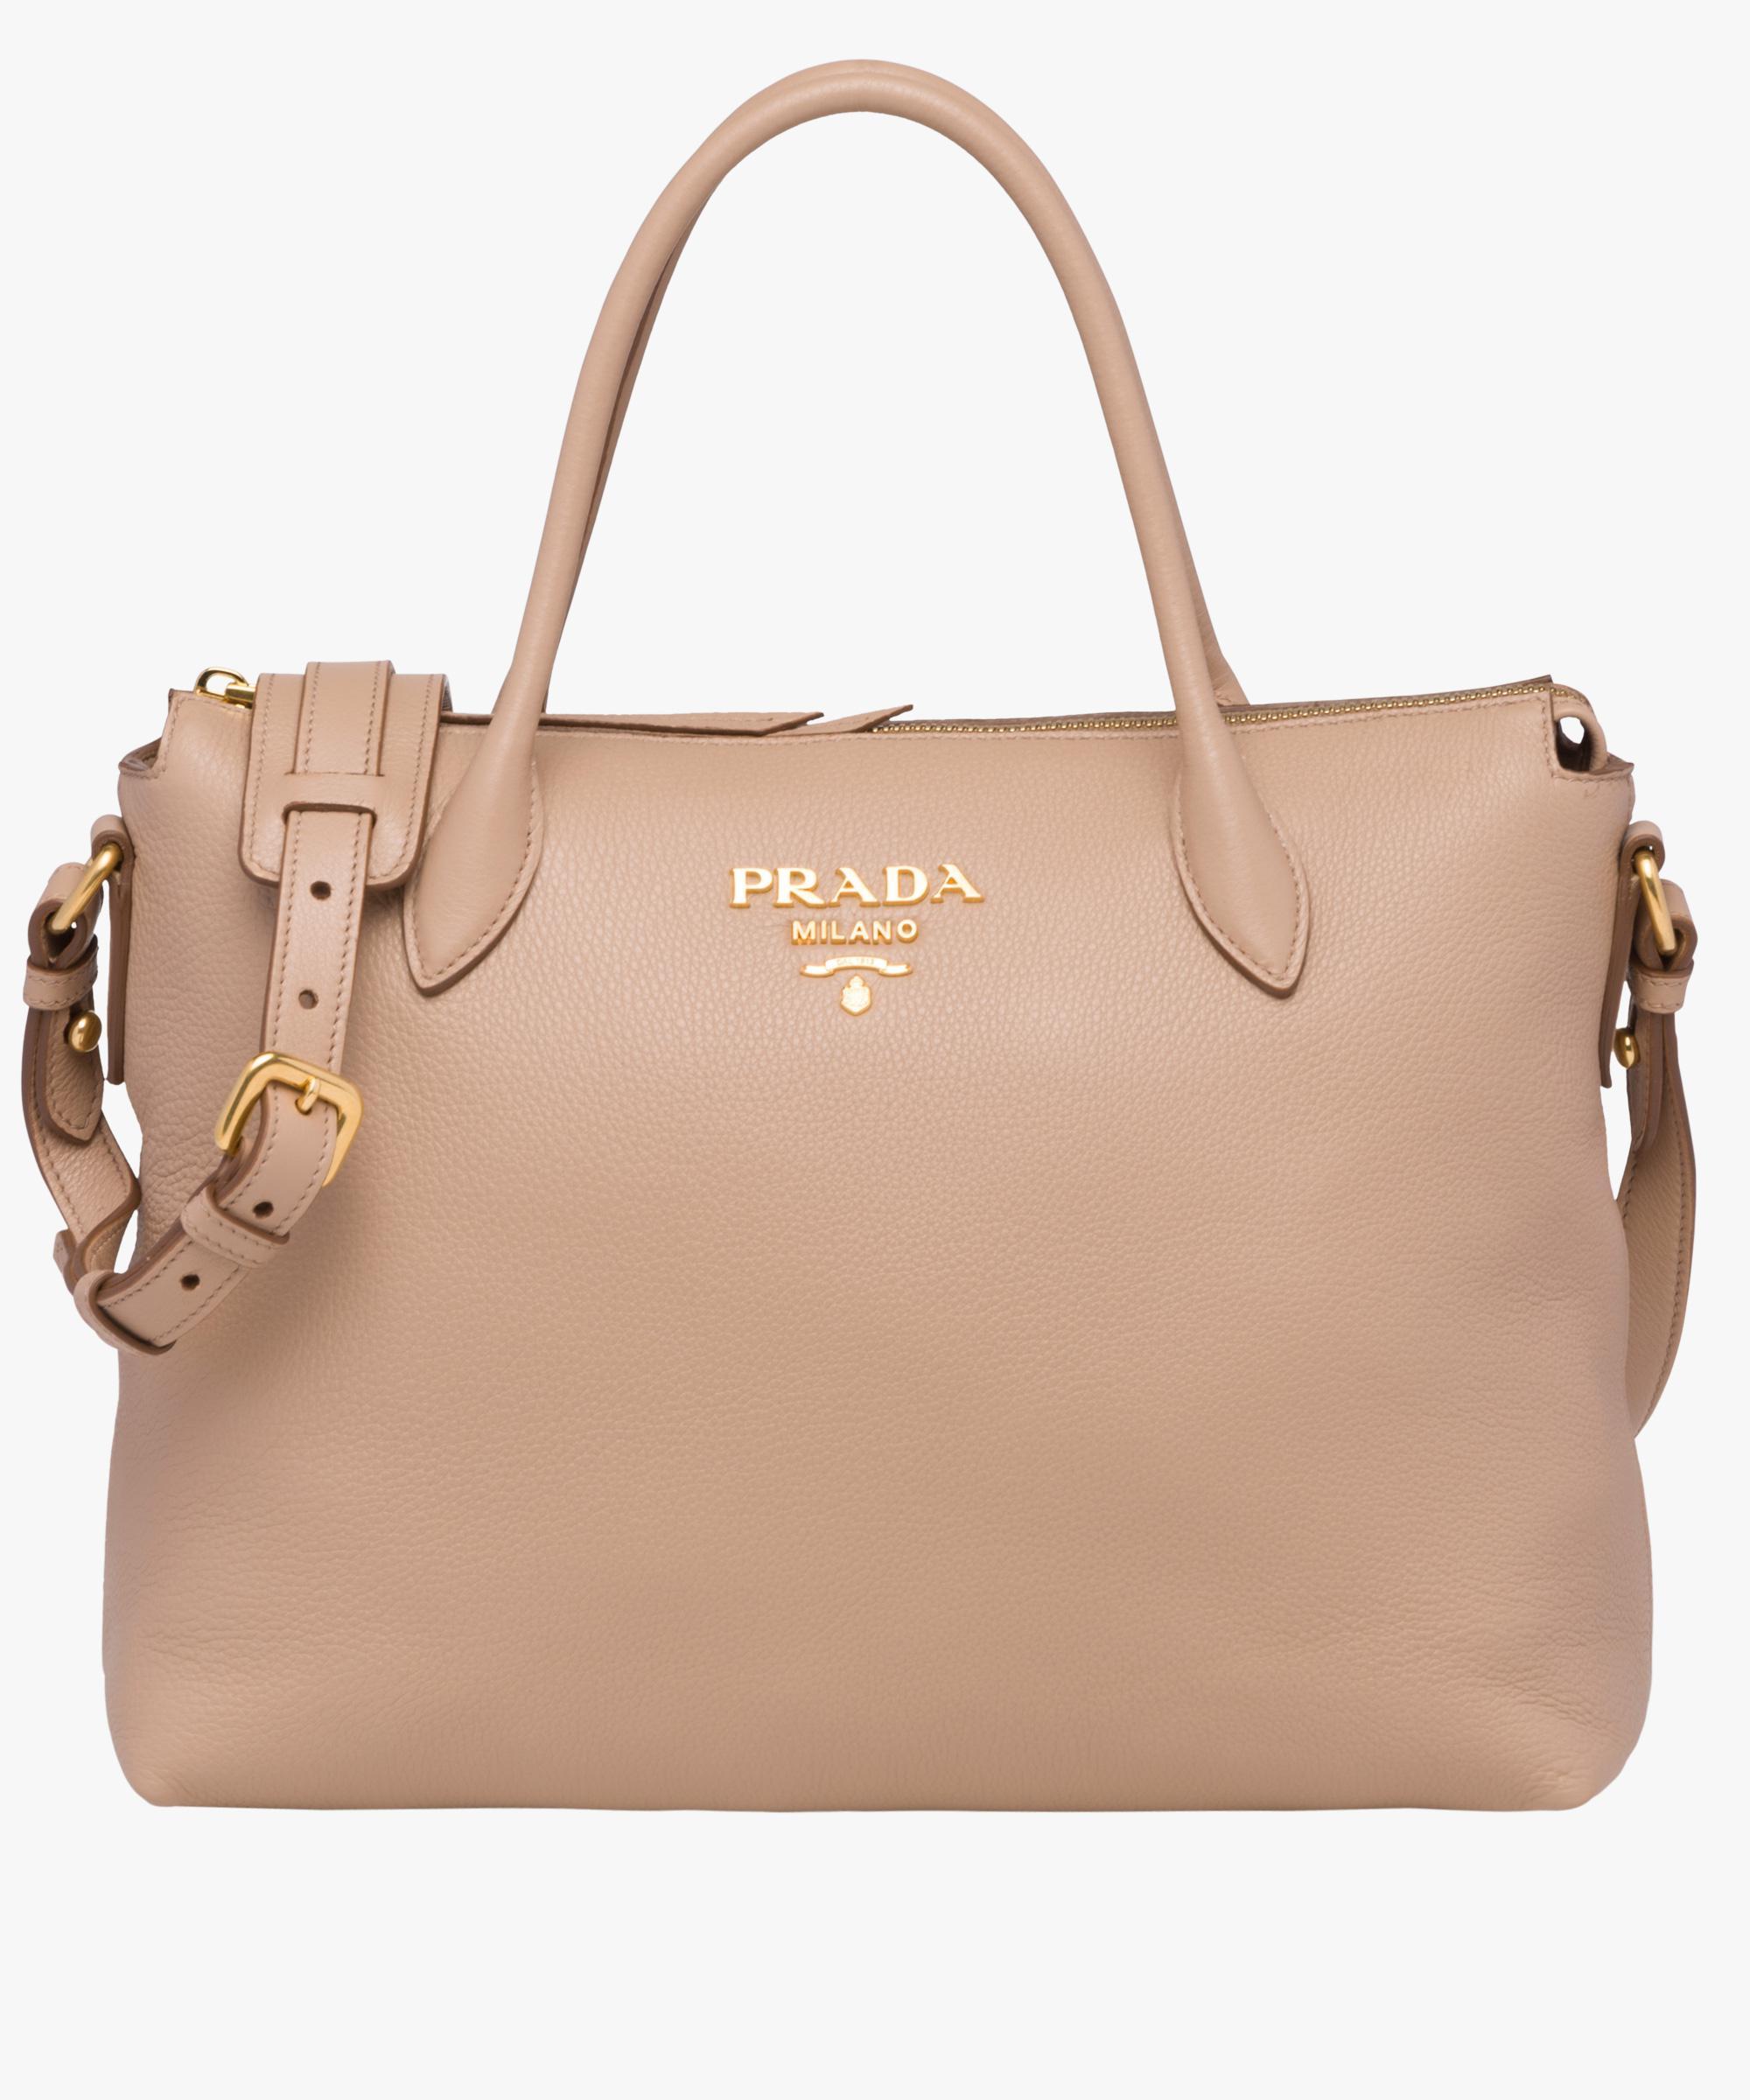 f0457a74b062 ... italy lyst prada calf leather bag in natural 2b9ab 07f46